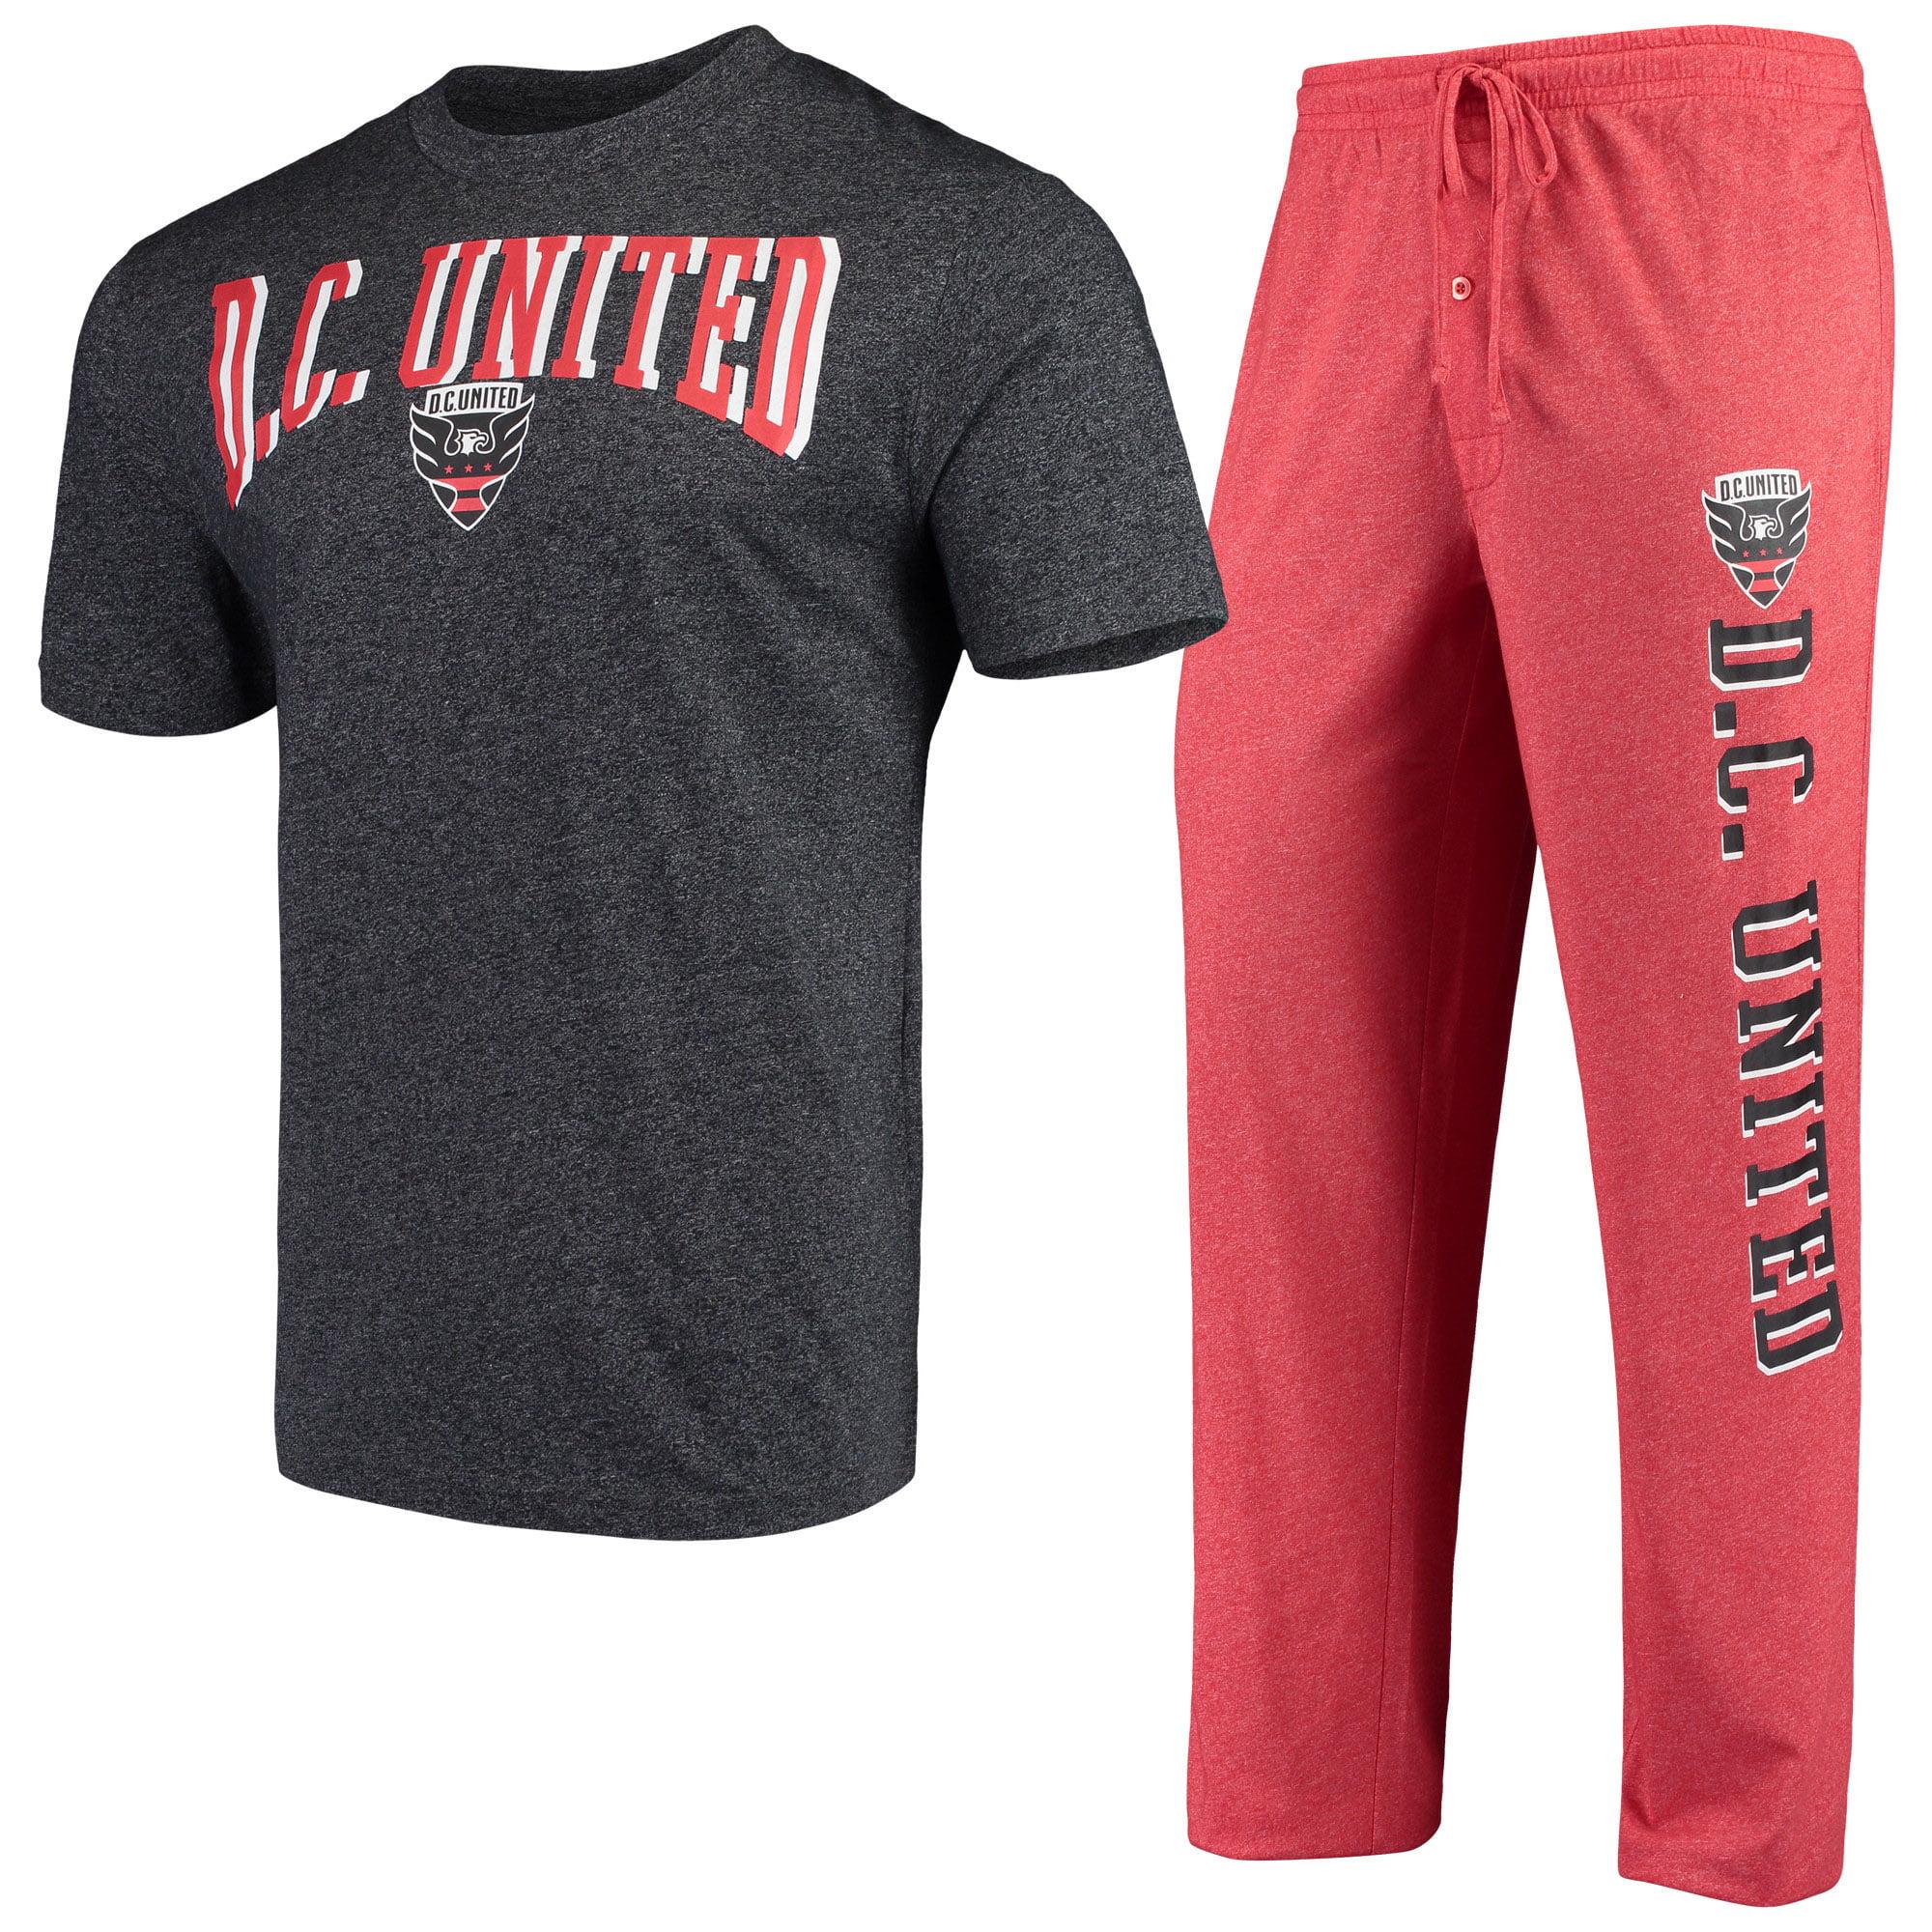 D.C. United Concepts Sport Spar Pants & Top Sleep Set - Red/Charcoal